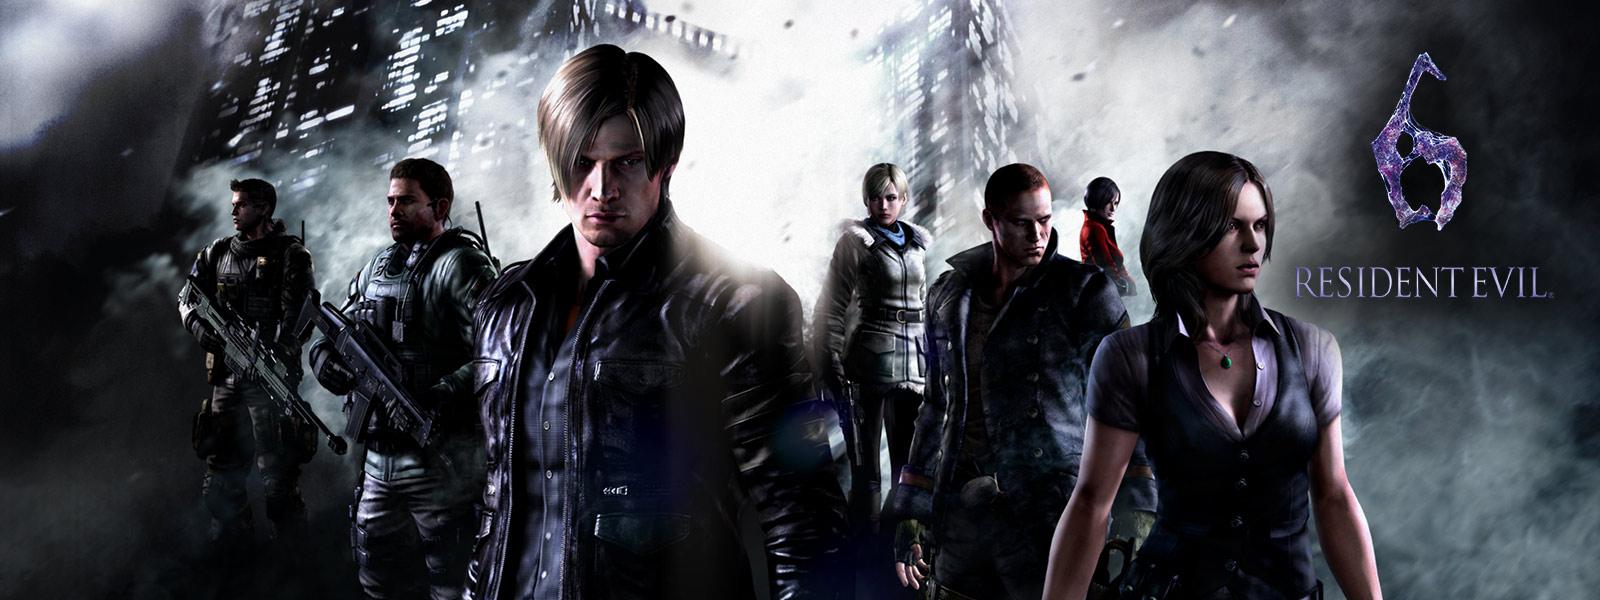 Resident Evil 6 matchmaking